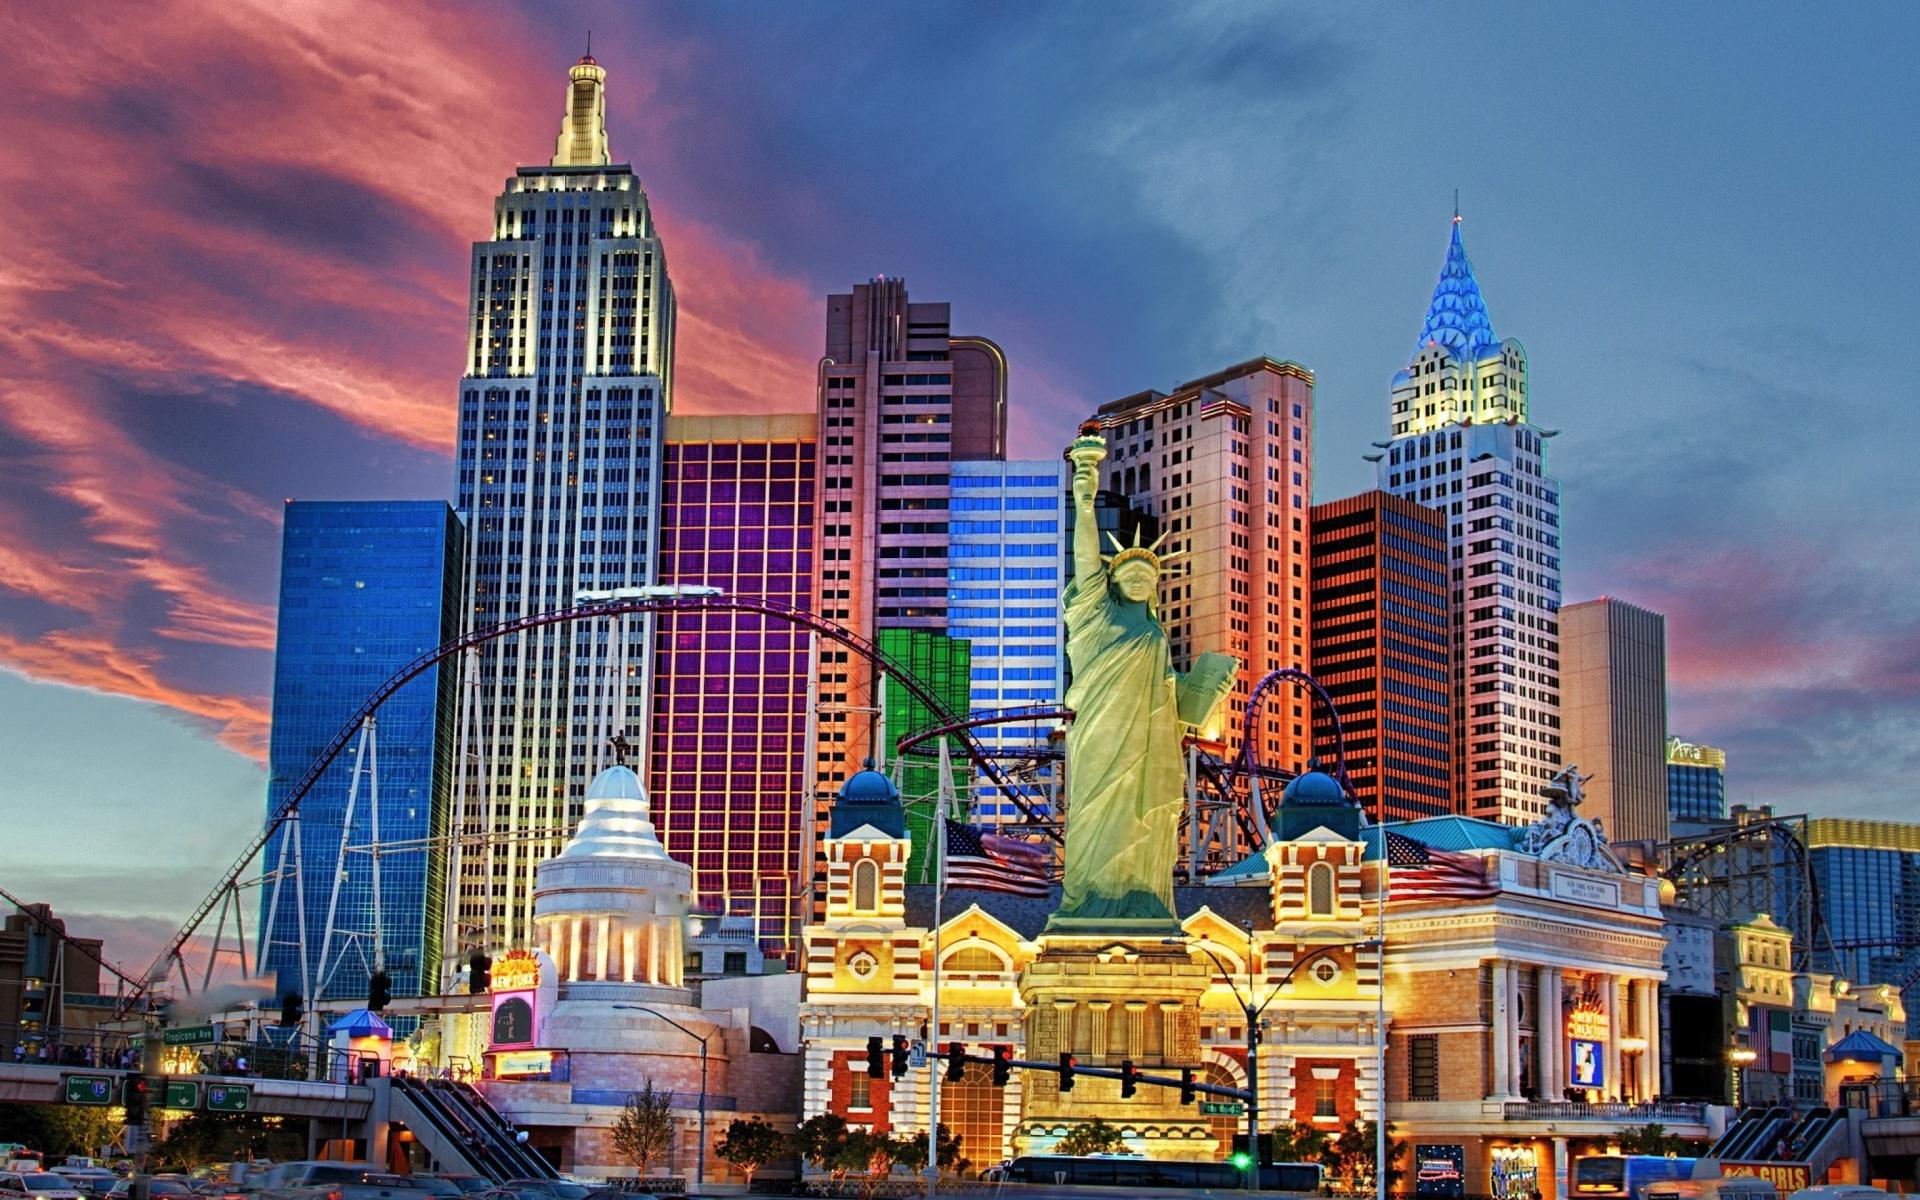 Las Vegas Hotel Wallpaper for Widescreen Desktop PC ...